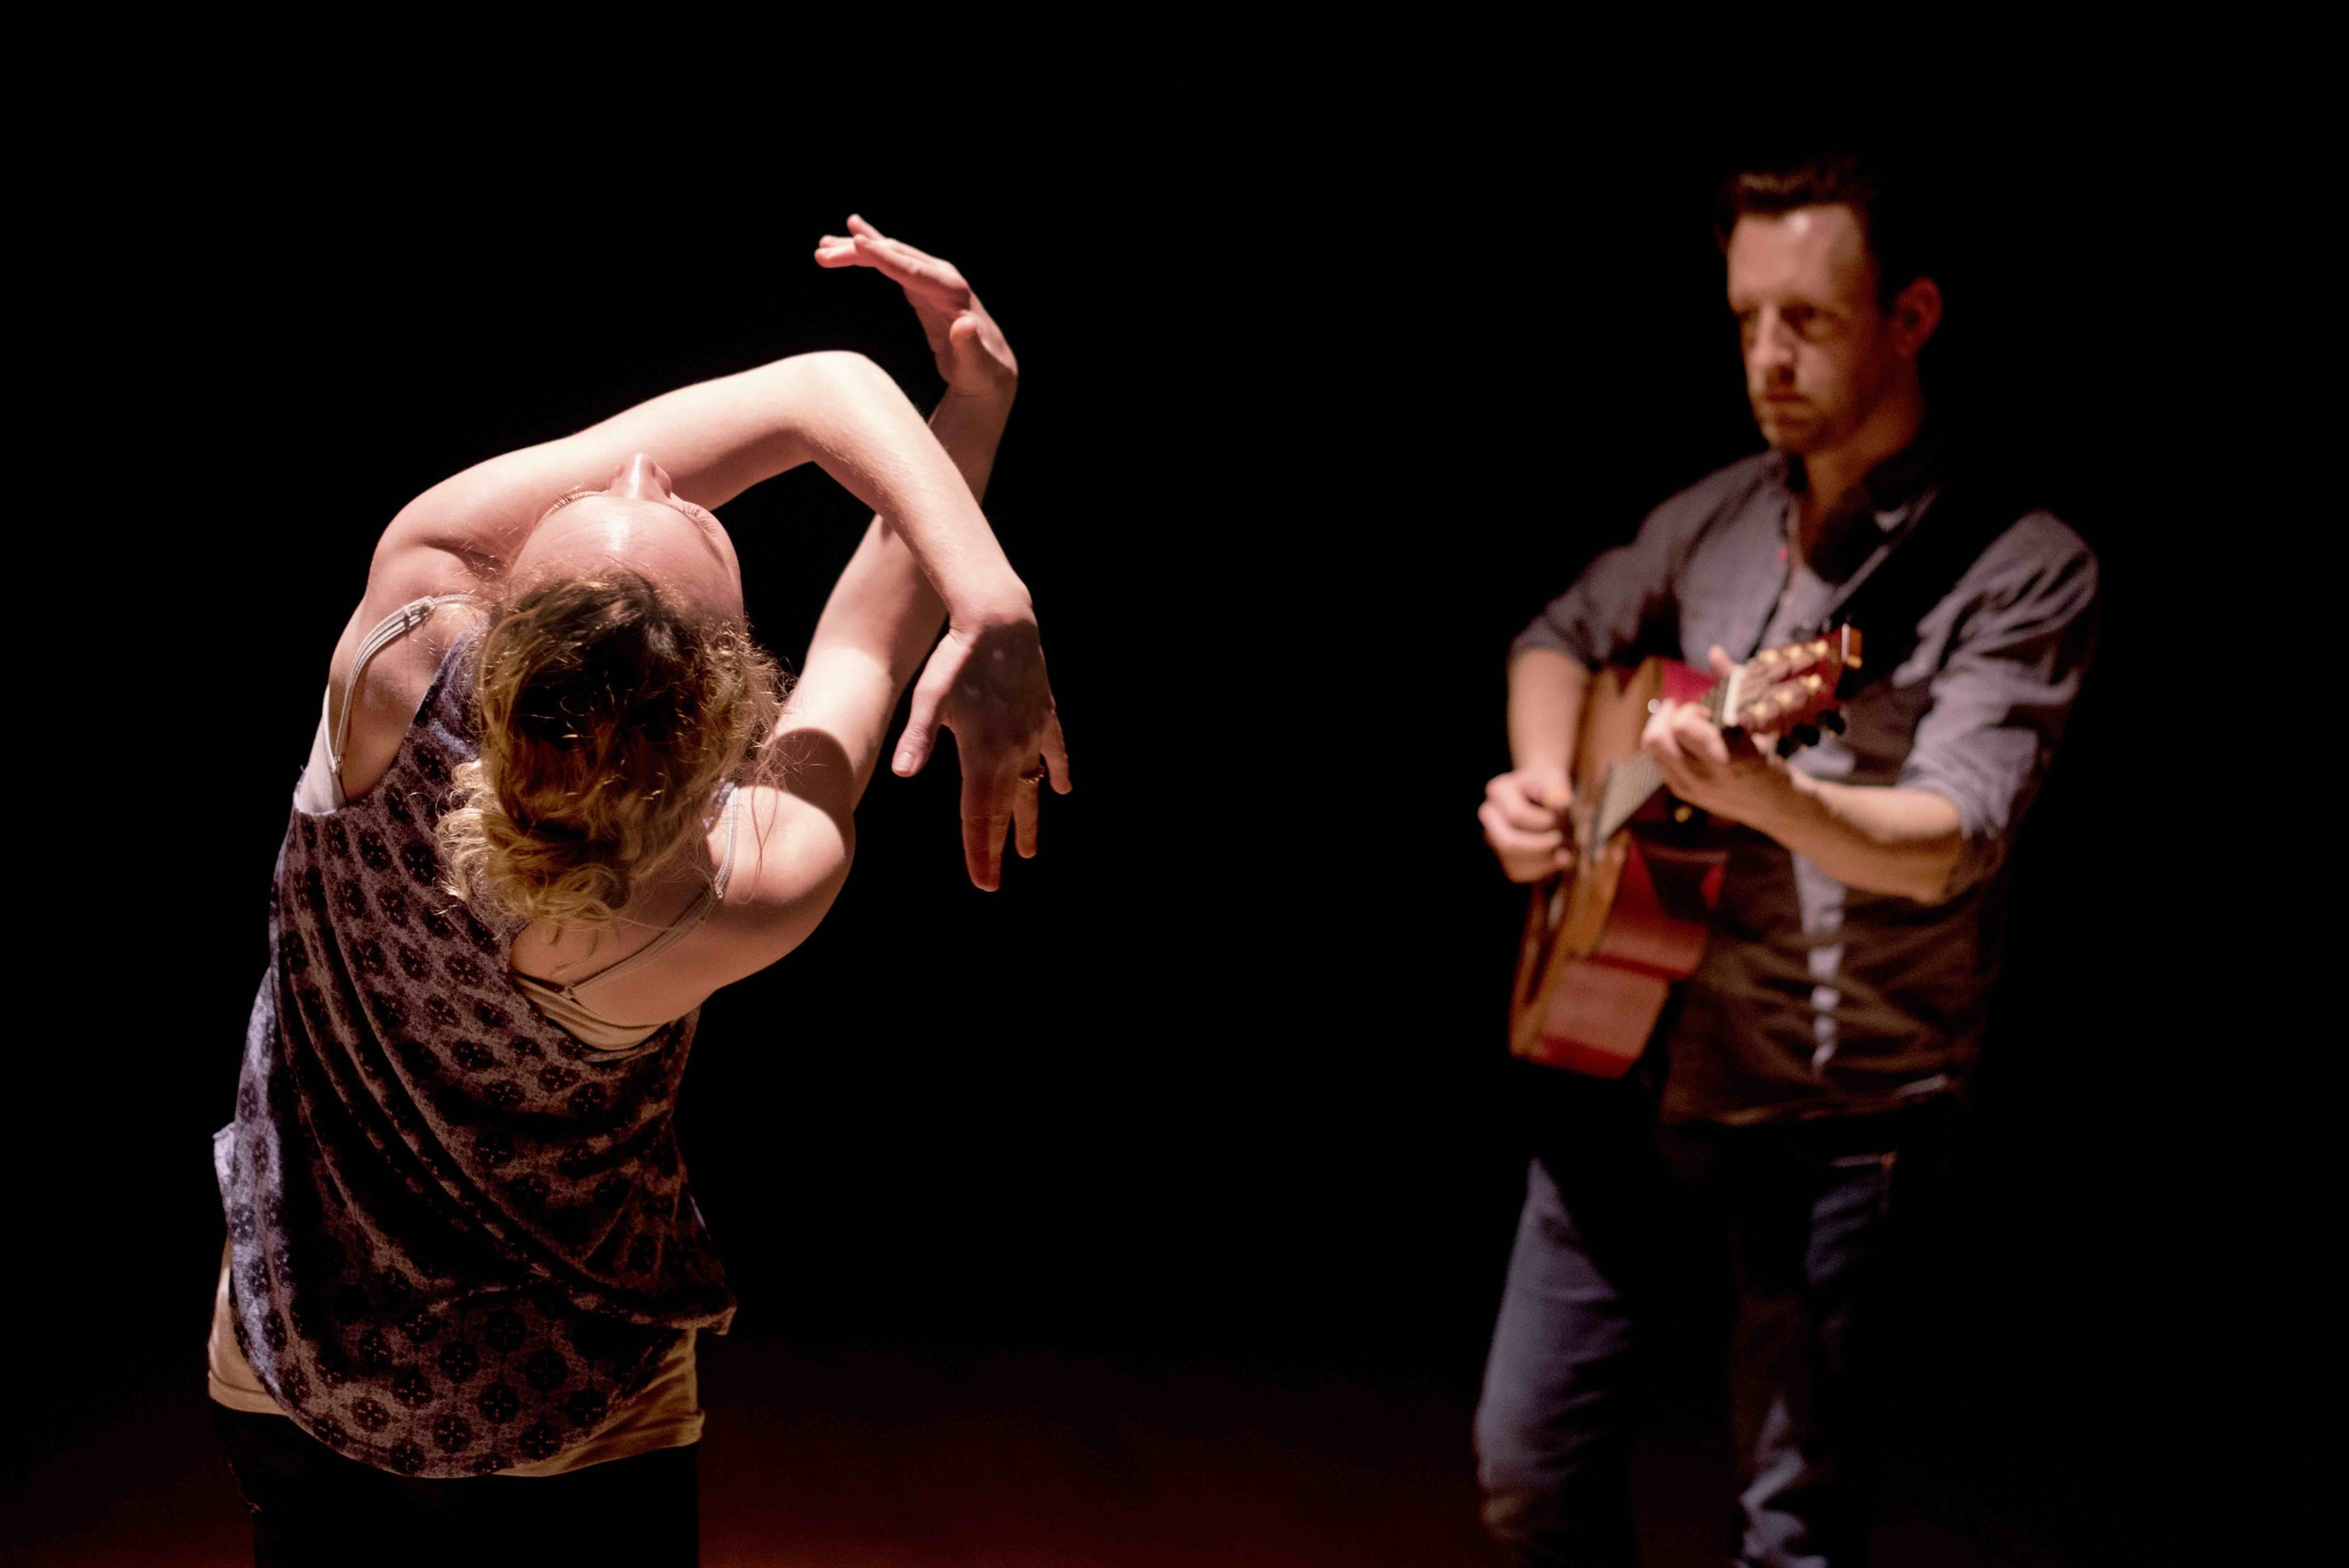 Tim Van Eyken & Dani B Larsen in 'Untitled' (Image by Camilla Greenwell)